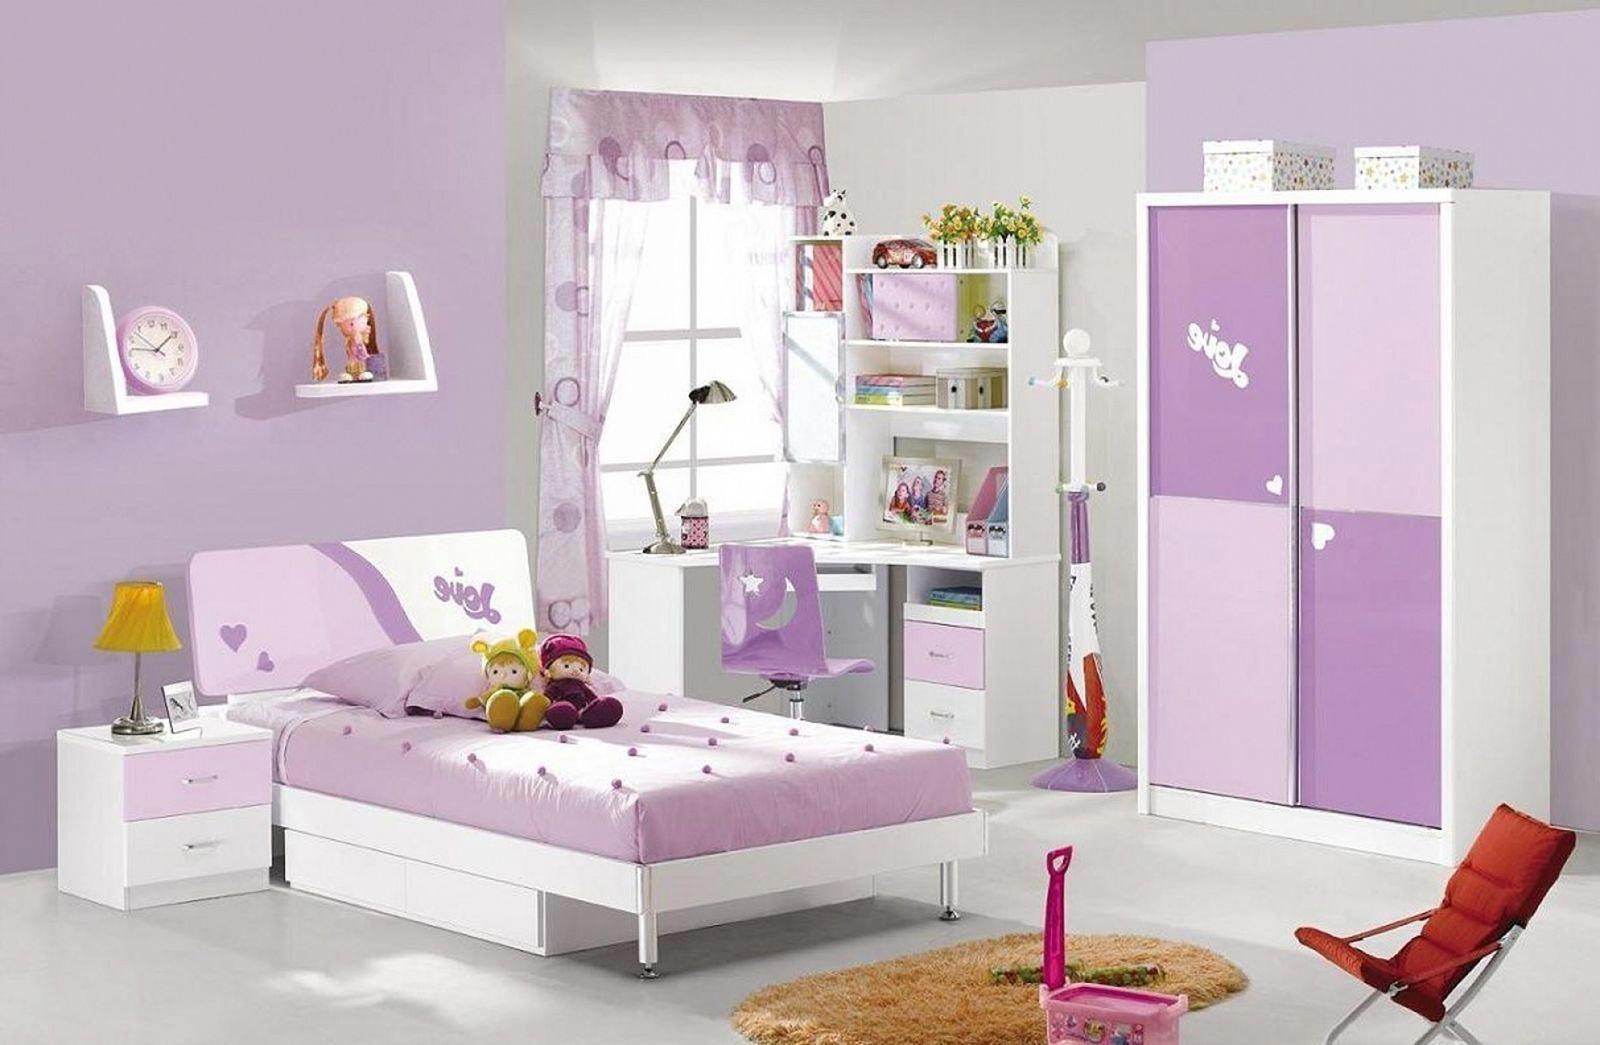 Furniture Best Quality Discountfurnituretampa Kids Bedroom Furniture Sets Bedroom Furniture Sets Kids Bedroom Sets